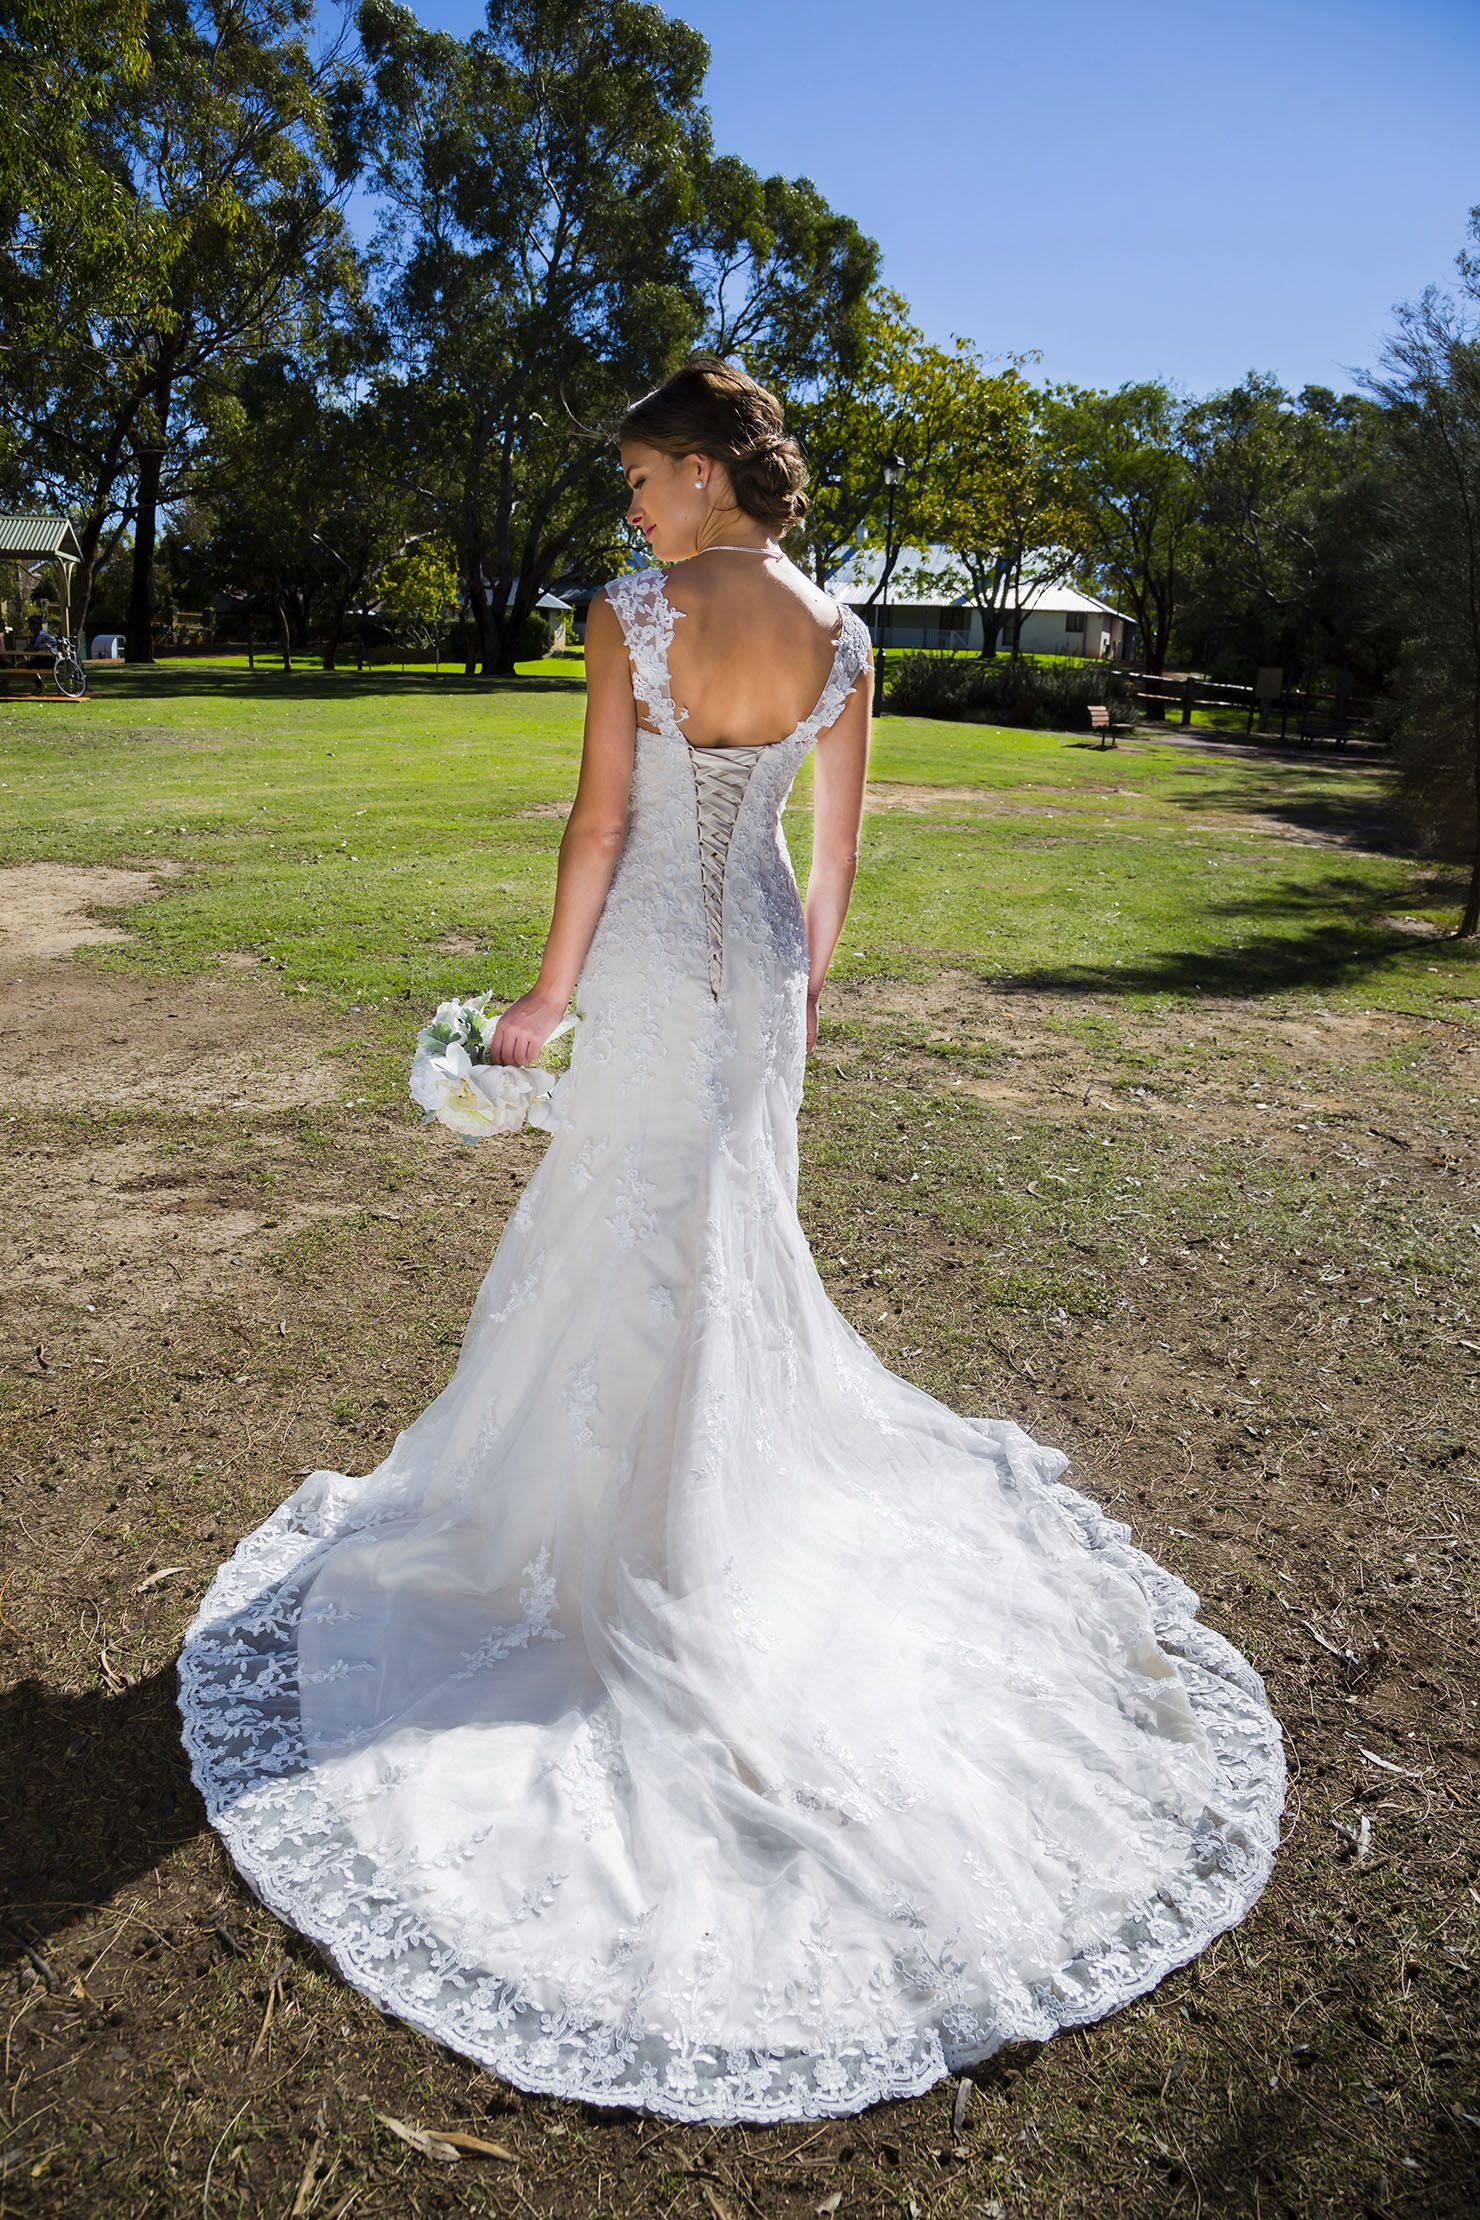 After5 Bridal and Formal Wear : Cizzy CZ2297-1X | Cizzy Bridal ...